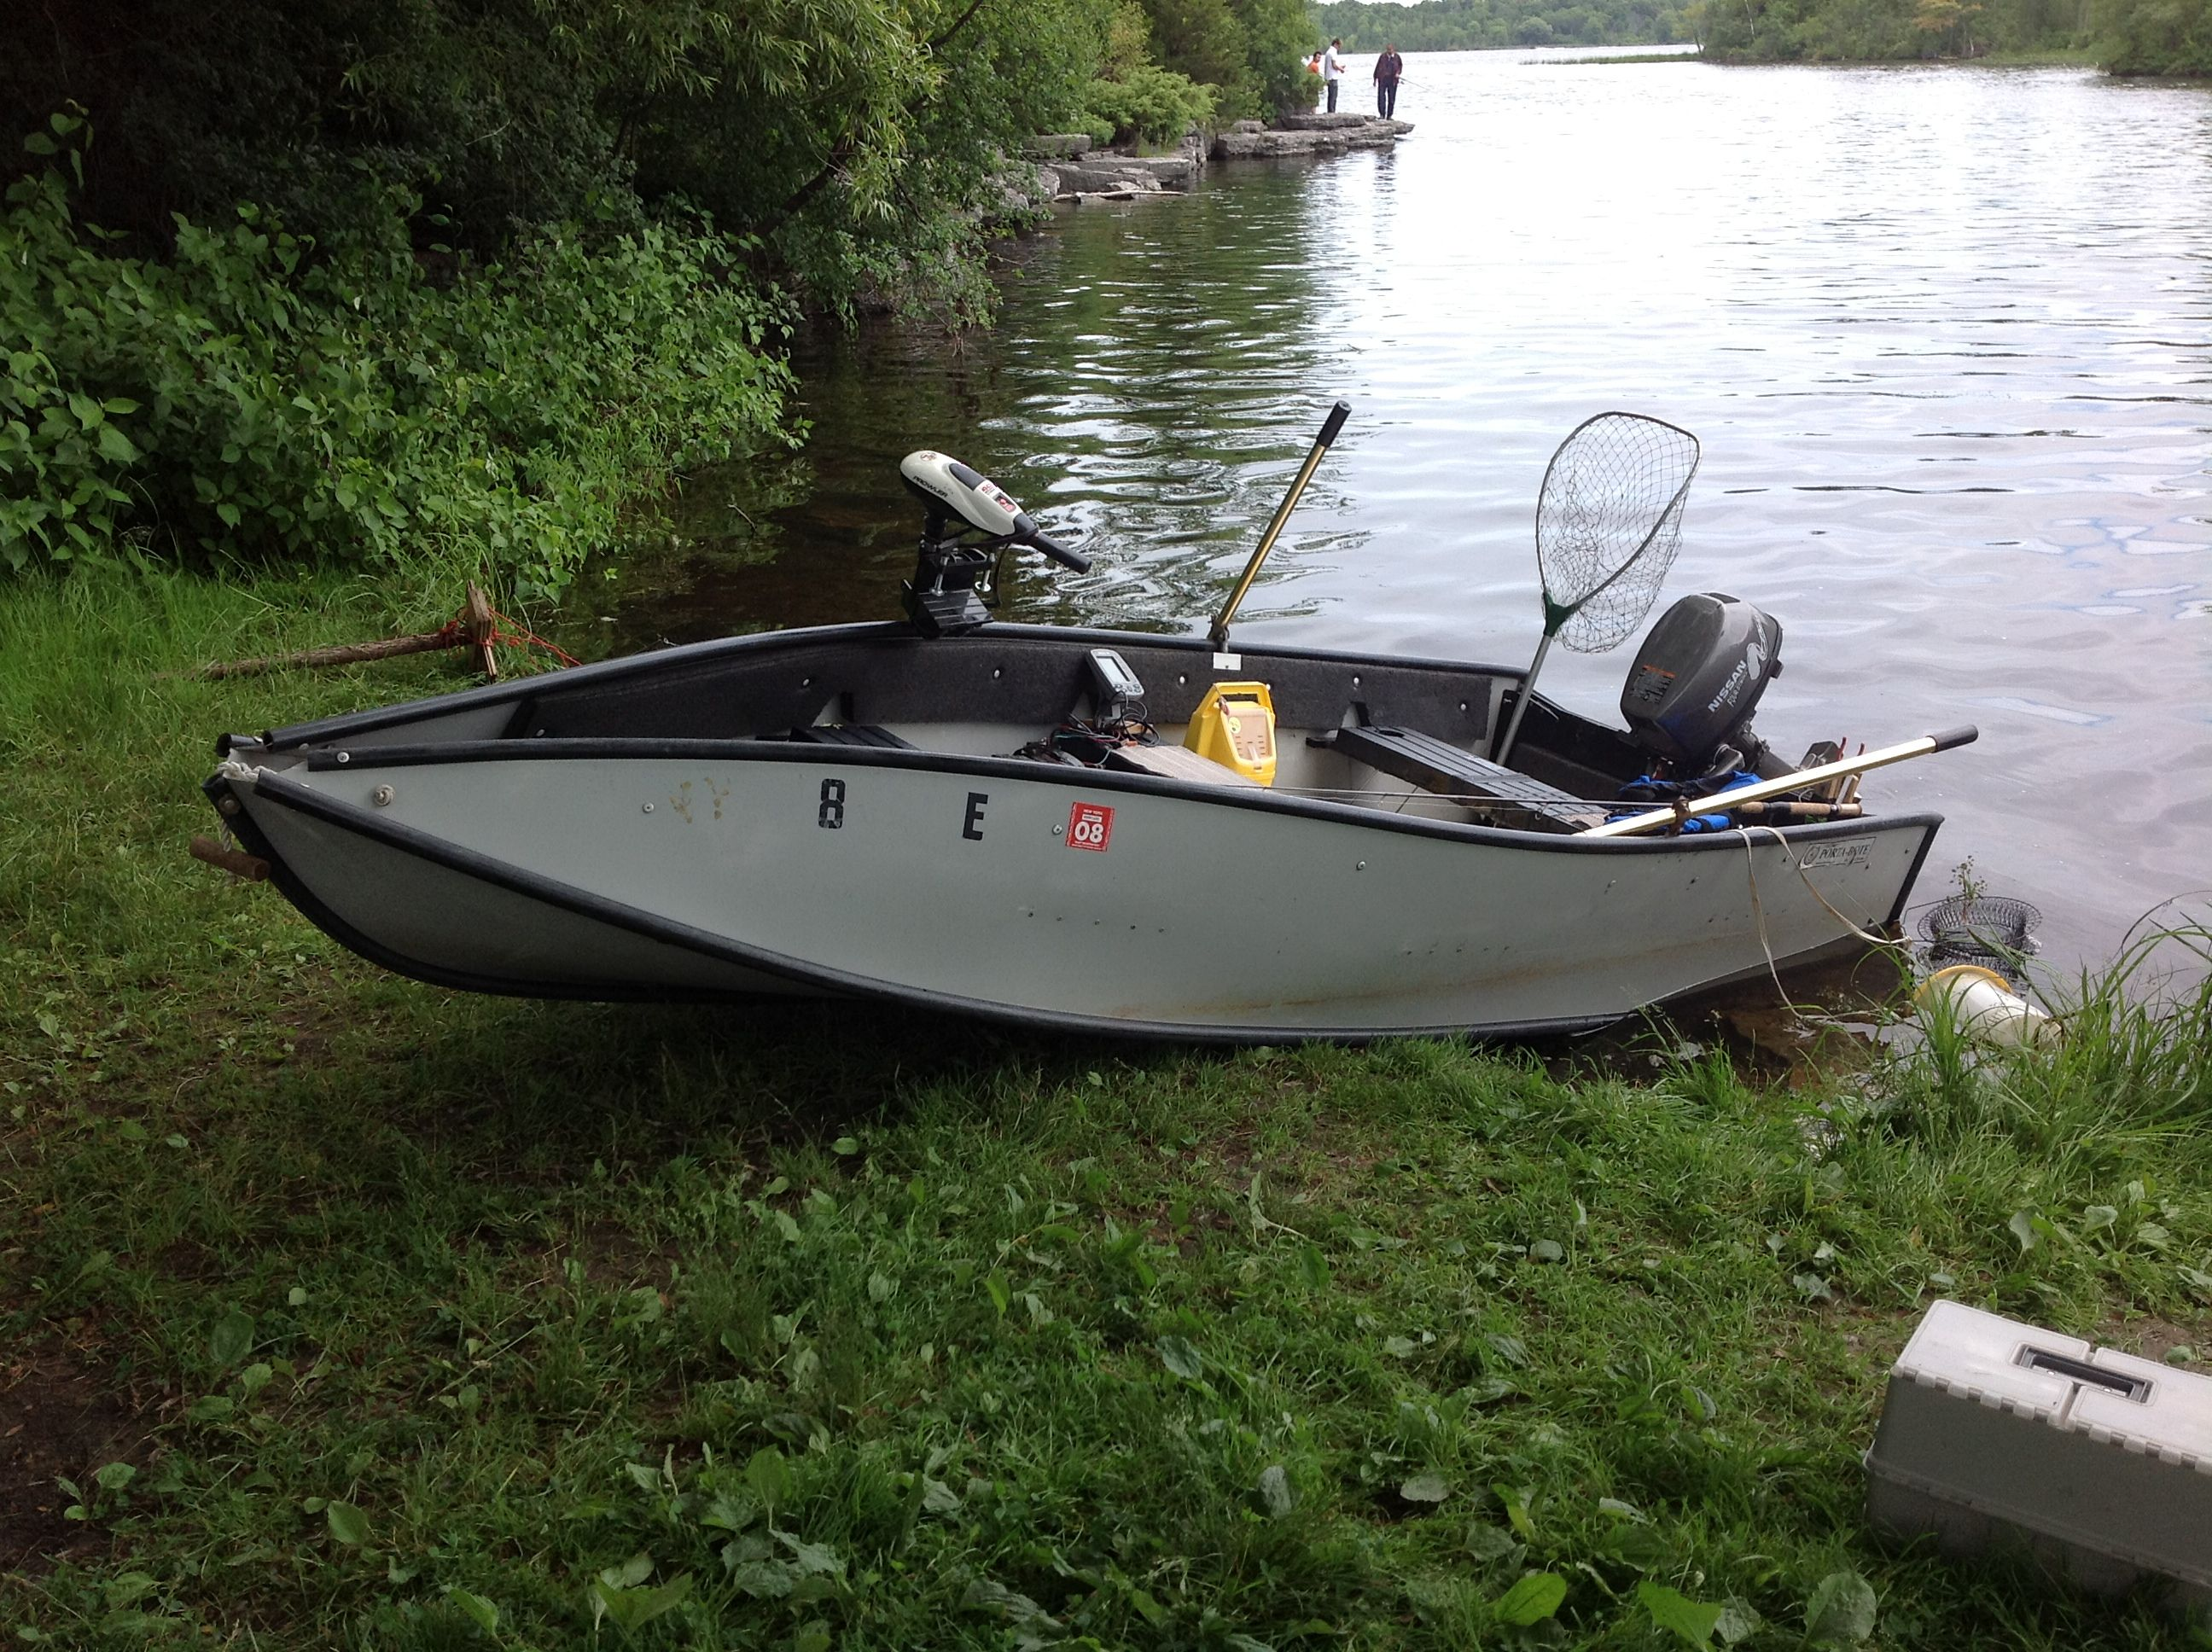 Porta bote fishing pinterest boating for Portable fishing boat